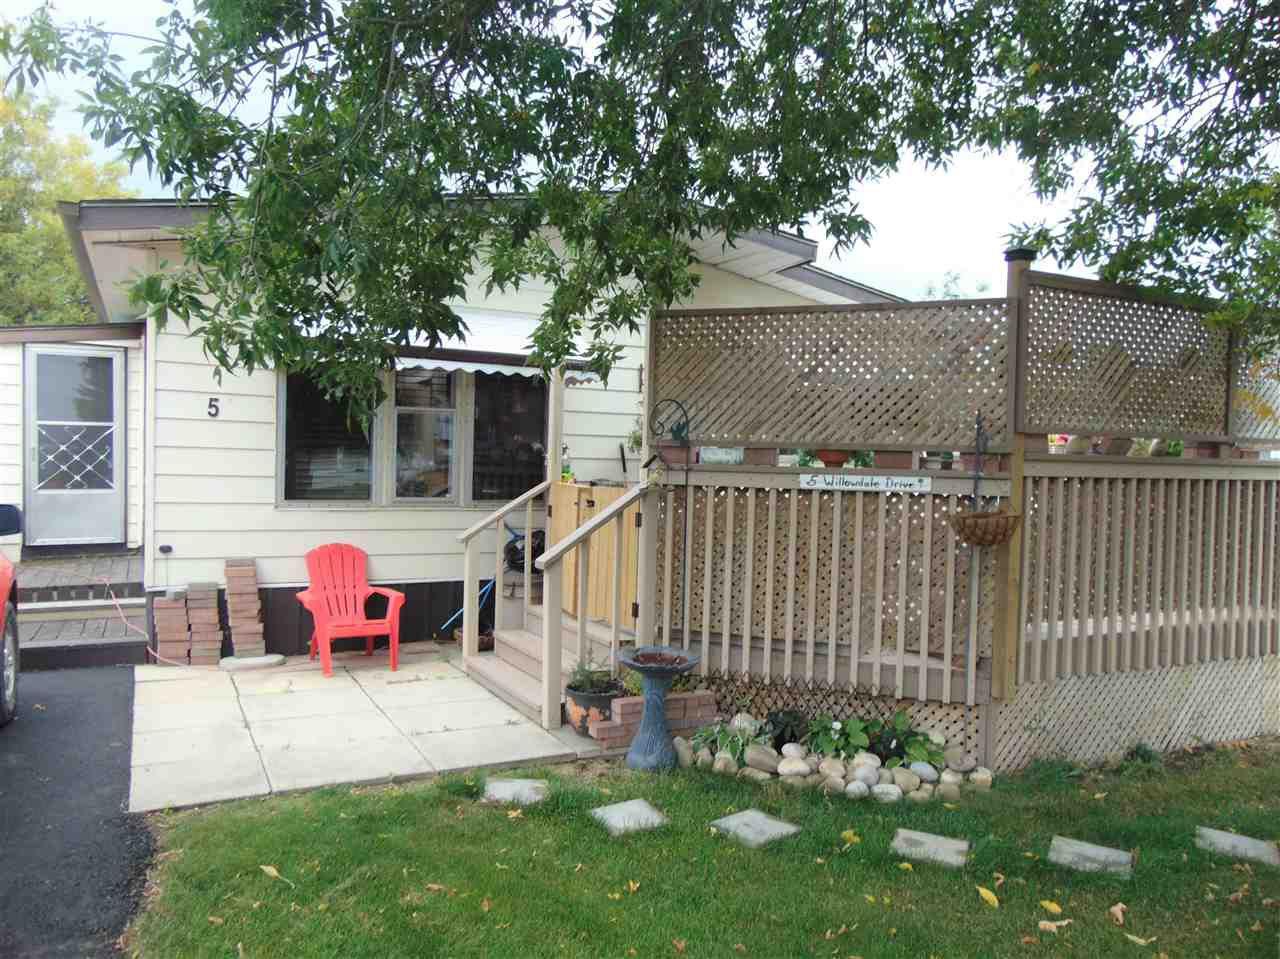 Main Photo: 5 willowdale Drive in Edmonton: Zone 42 Mobile for sale : MLS®# E4145662